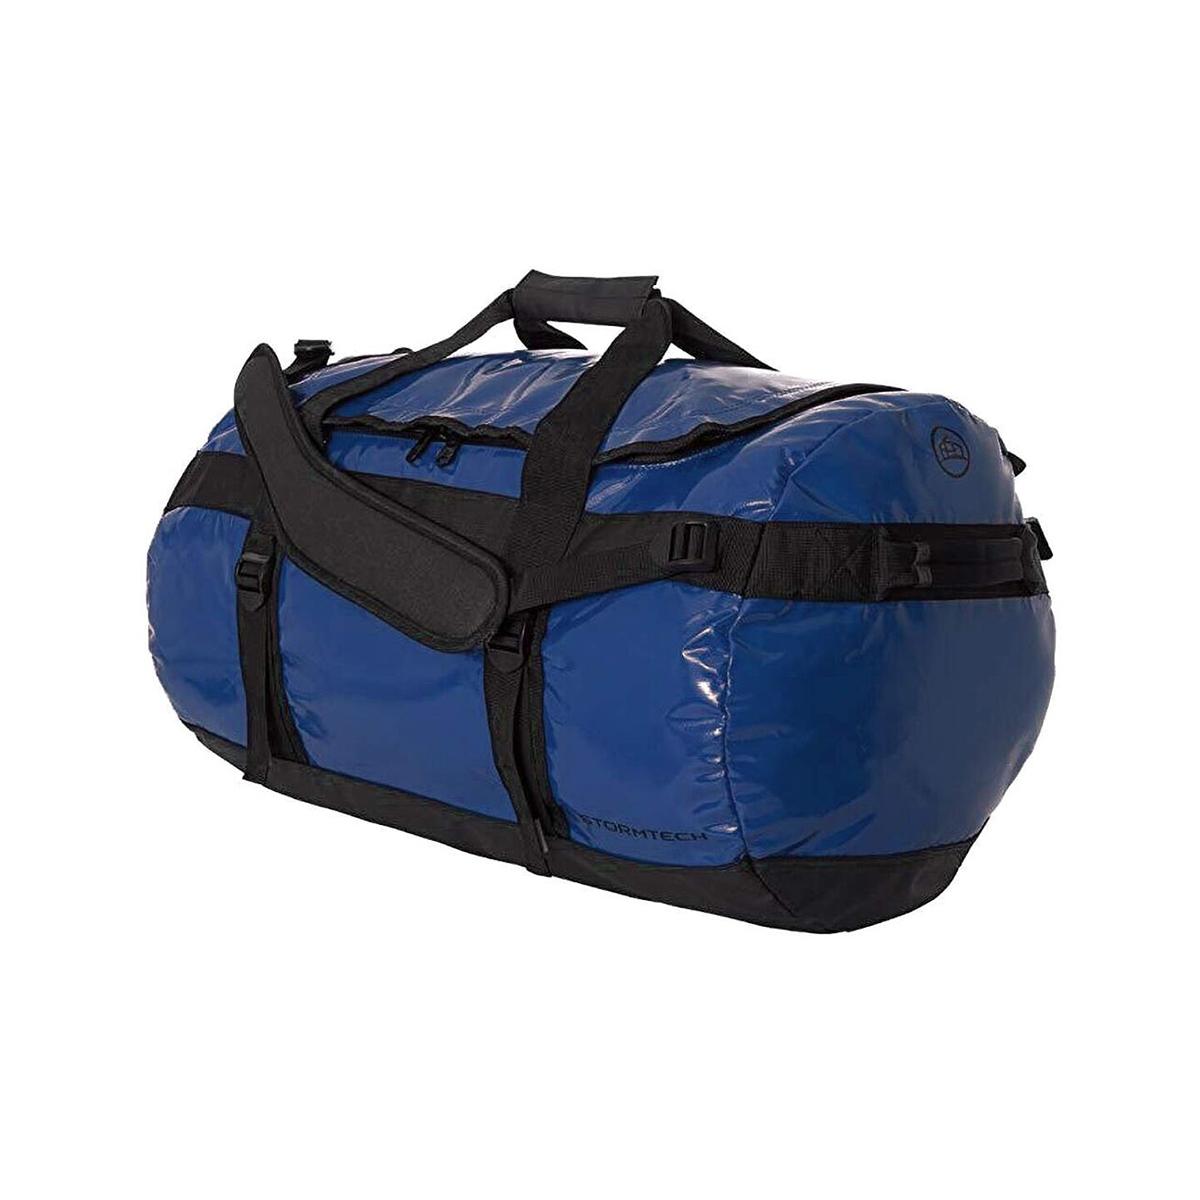 Stormtech Waterproof Gear Holdall Bag (Large) (One Size) (Black/Black)